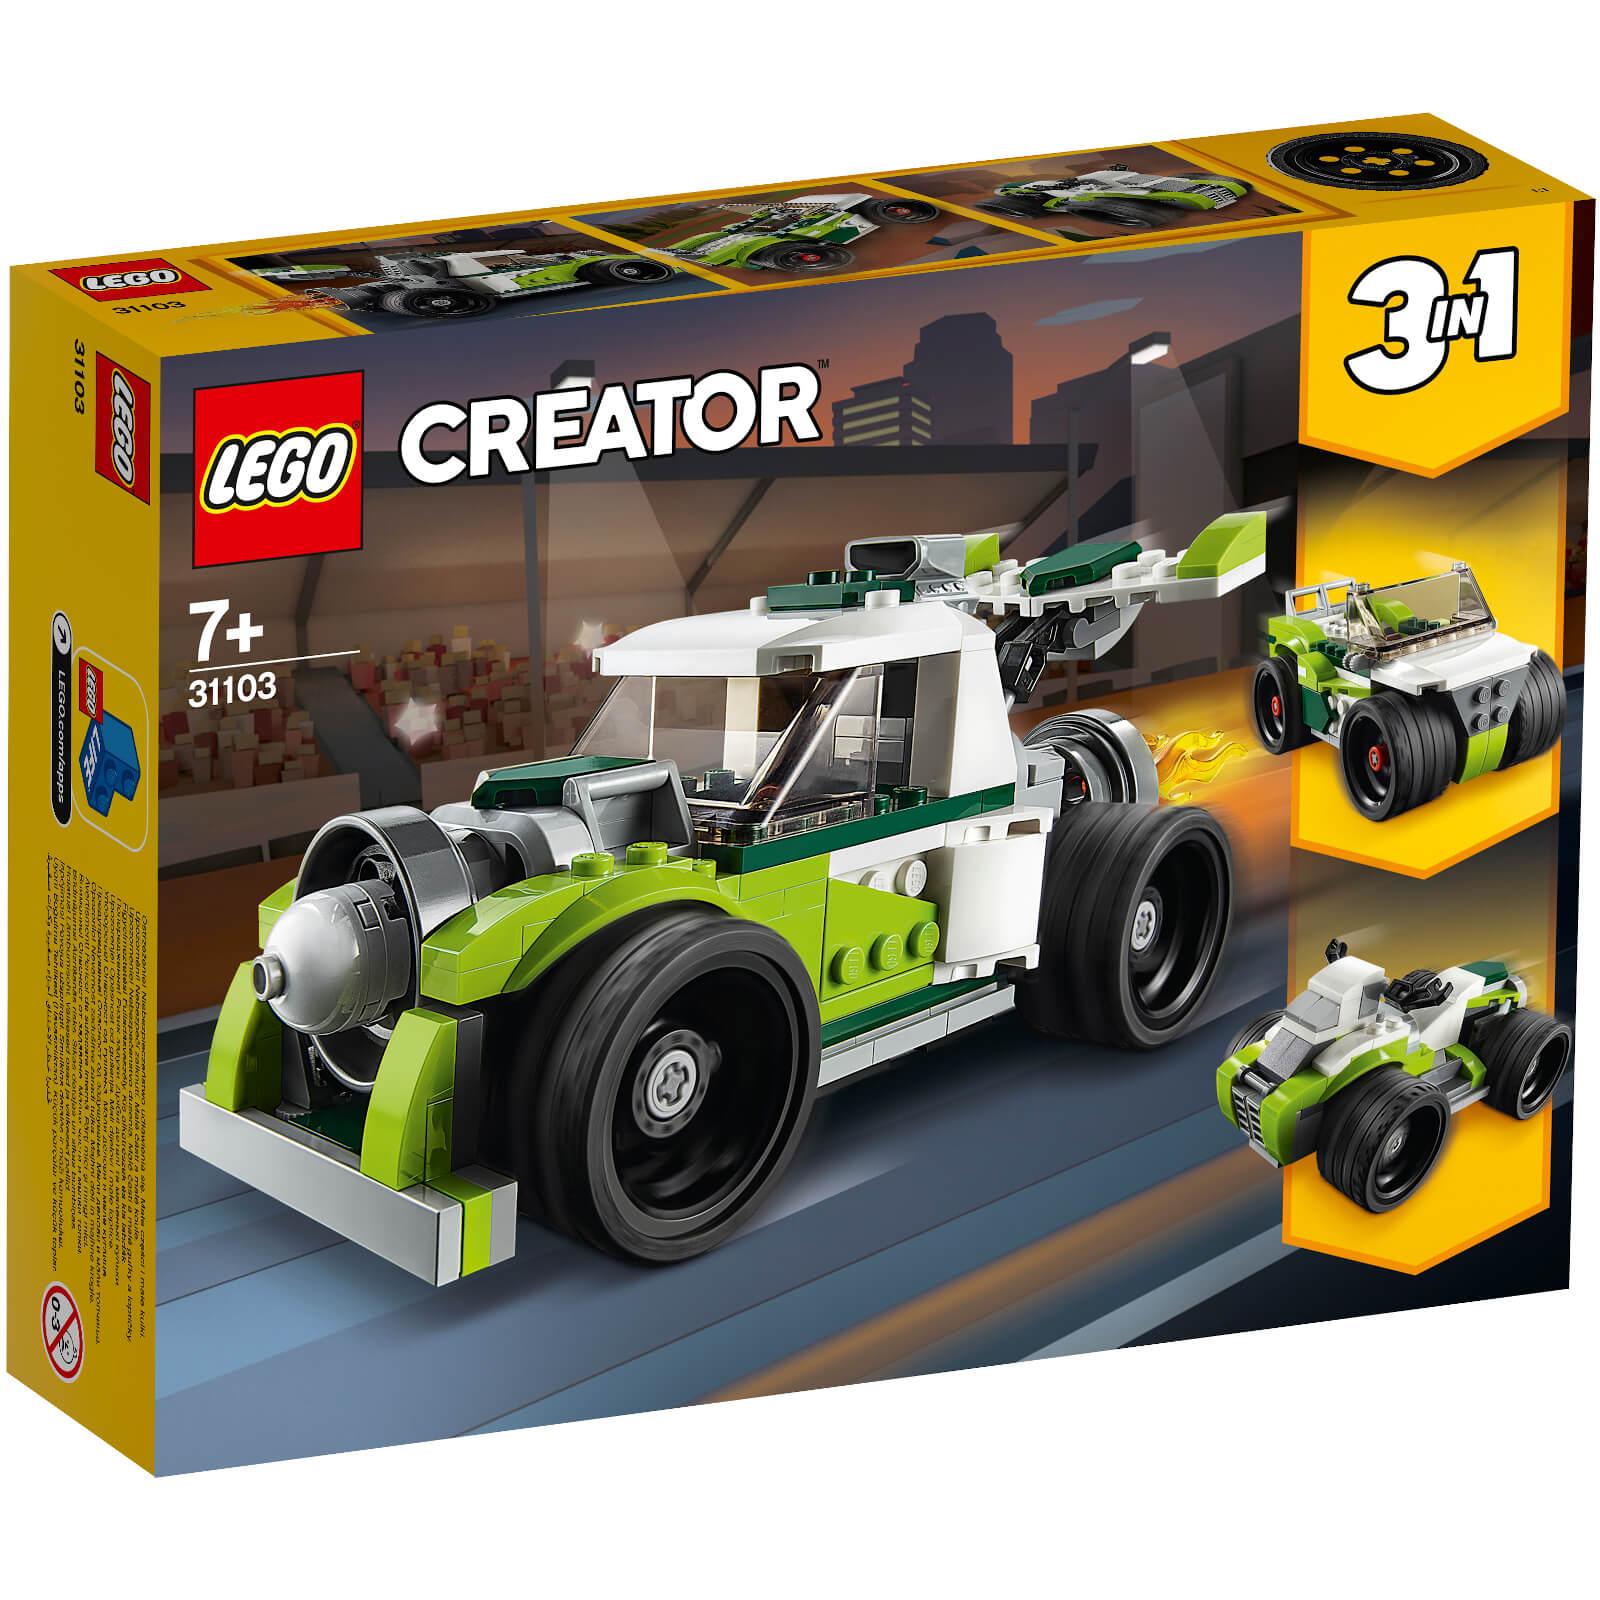 Lego Creator: Rocket Truck (31103)